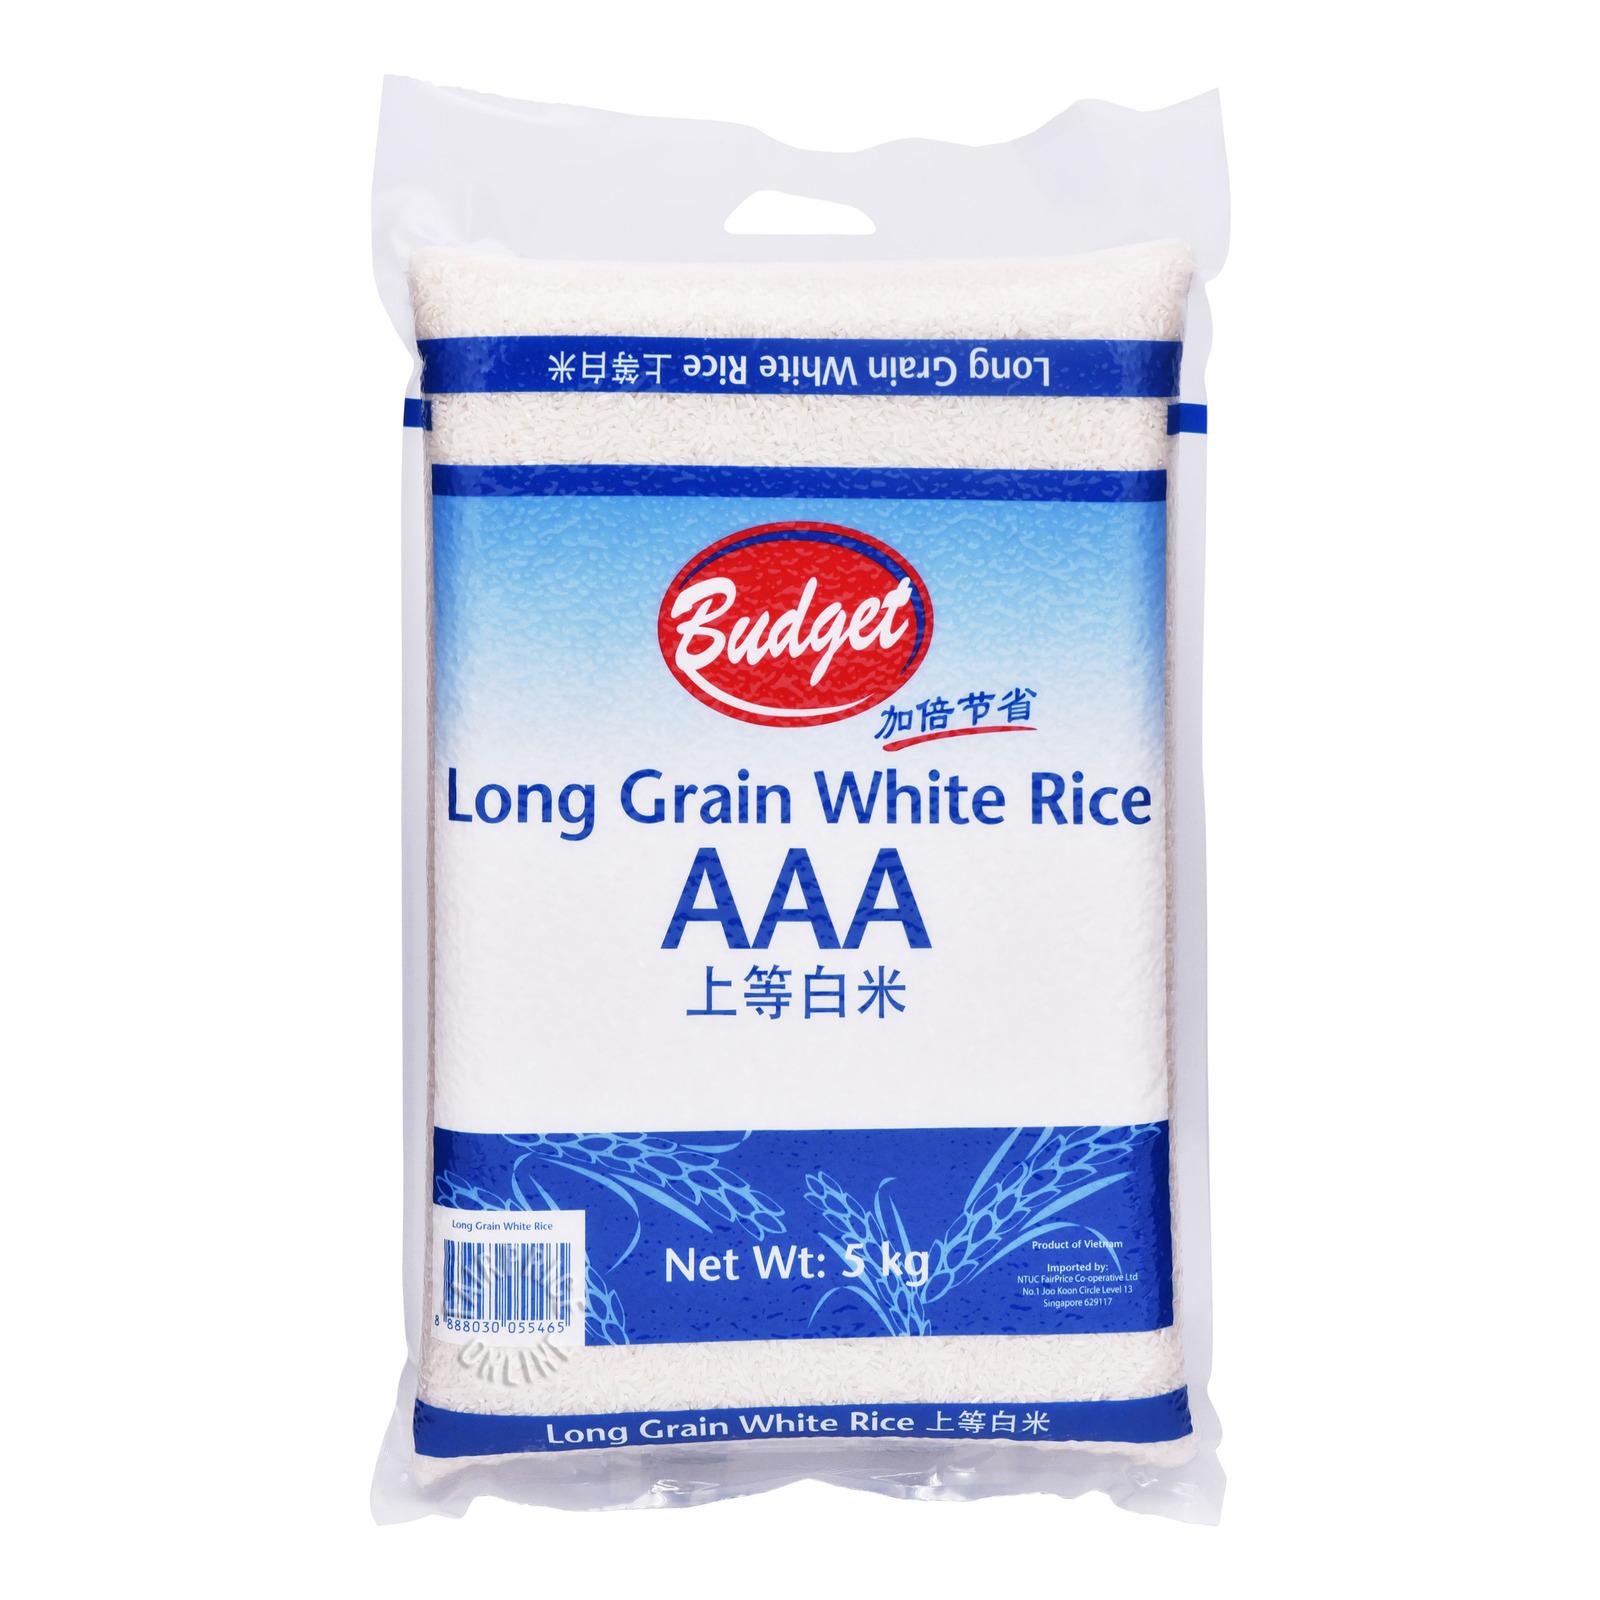 Budget White Rice - Long Grain